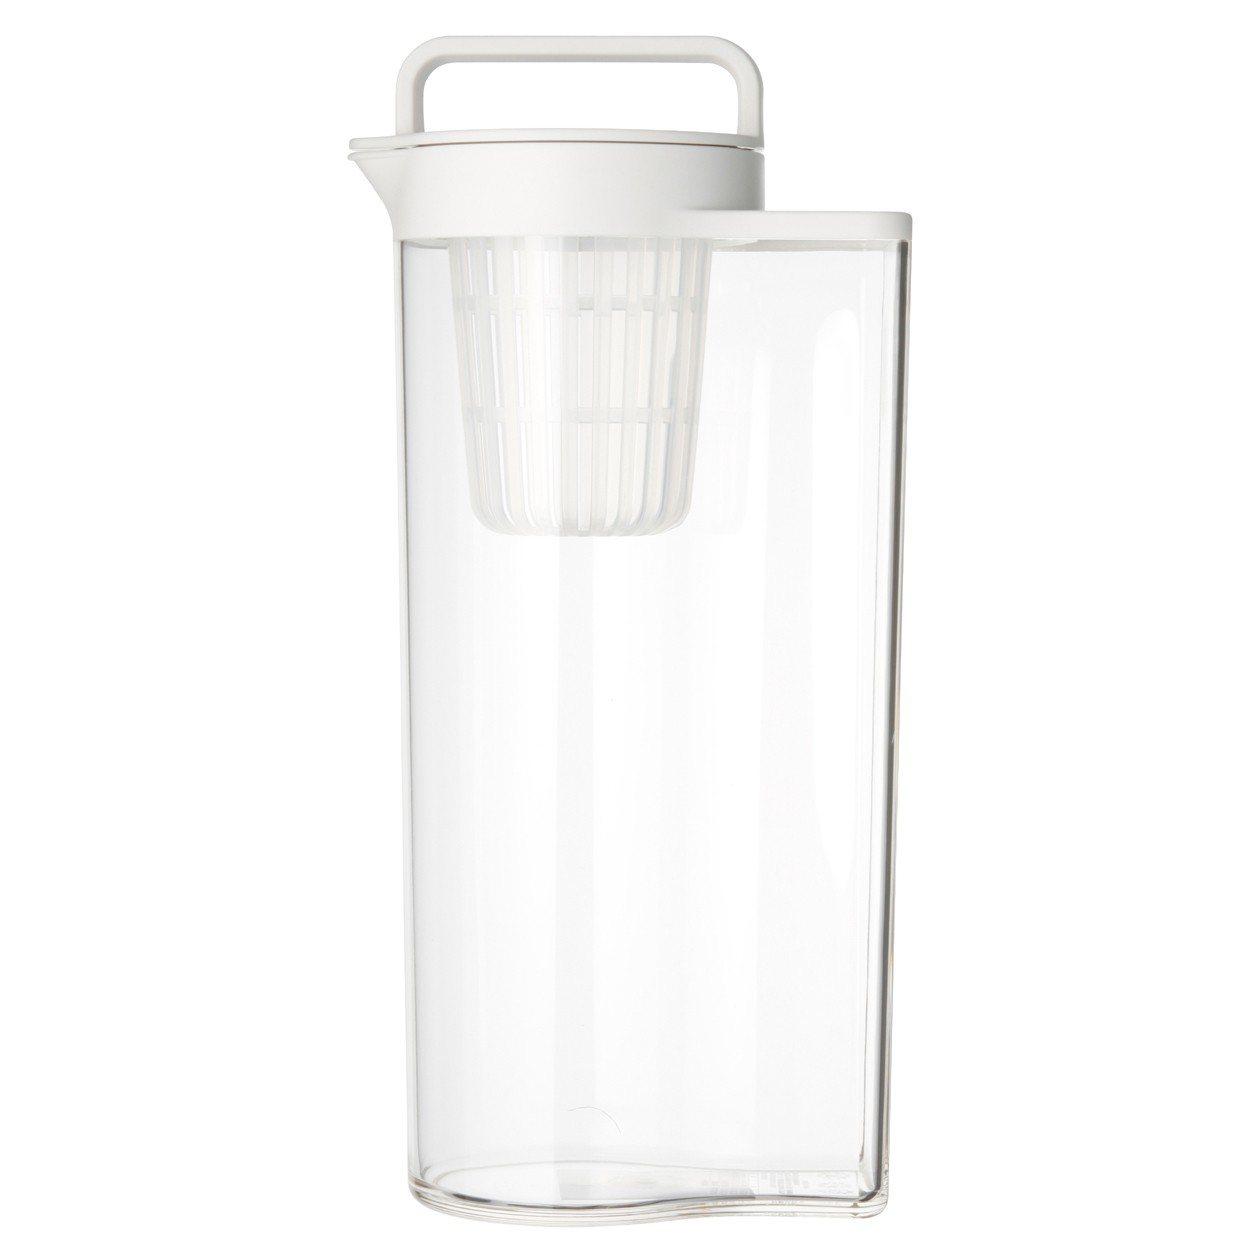 MUJI無印良品壓克力冷水筒2L,從原價390元調降為290元。圖/無印良品提供